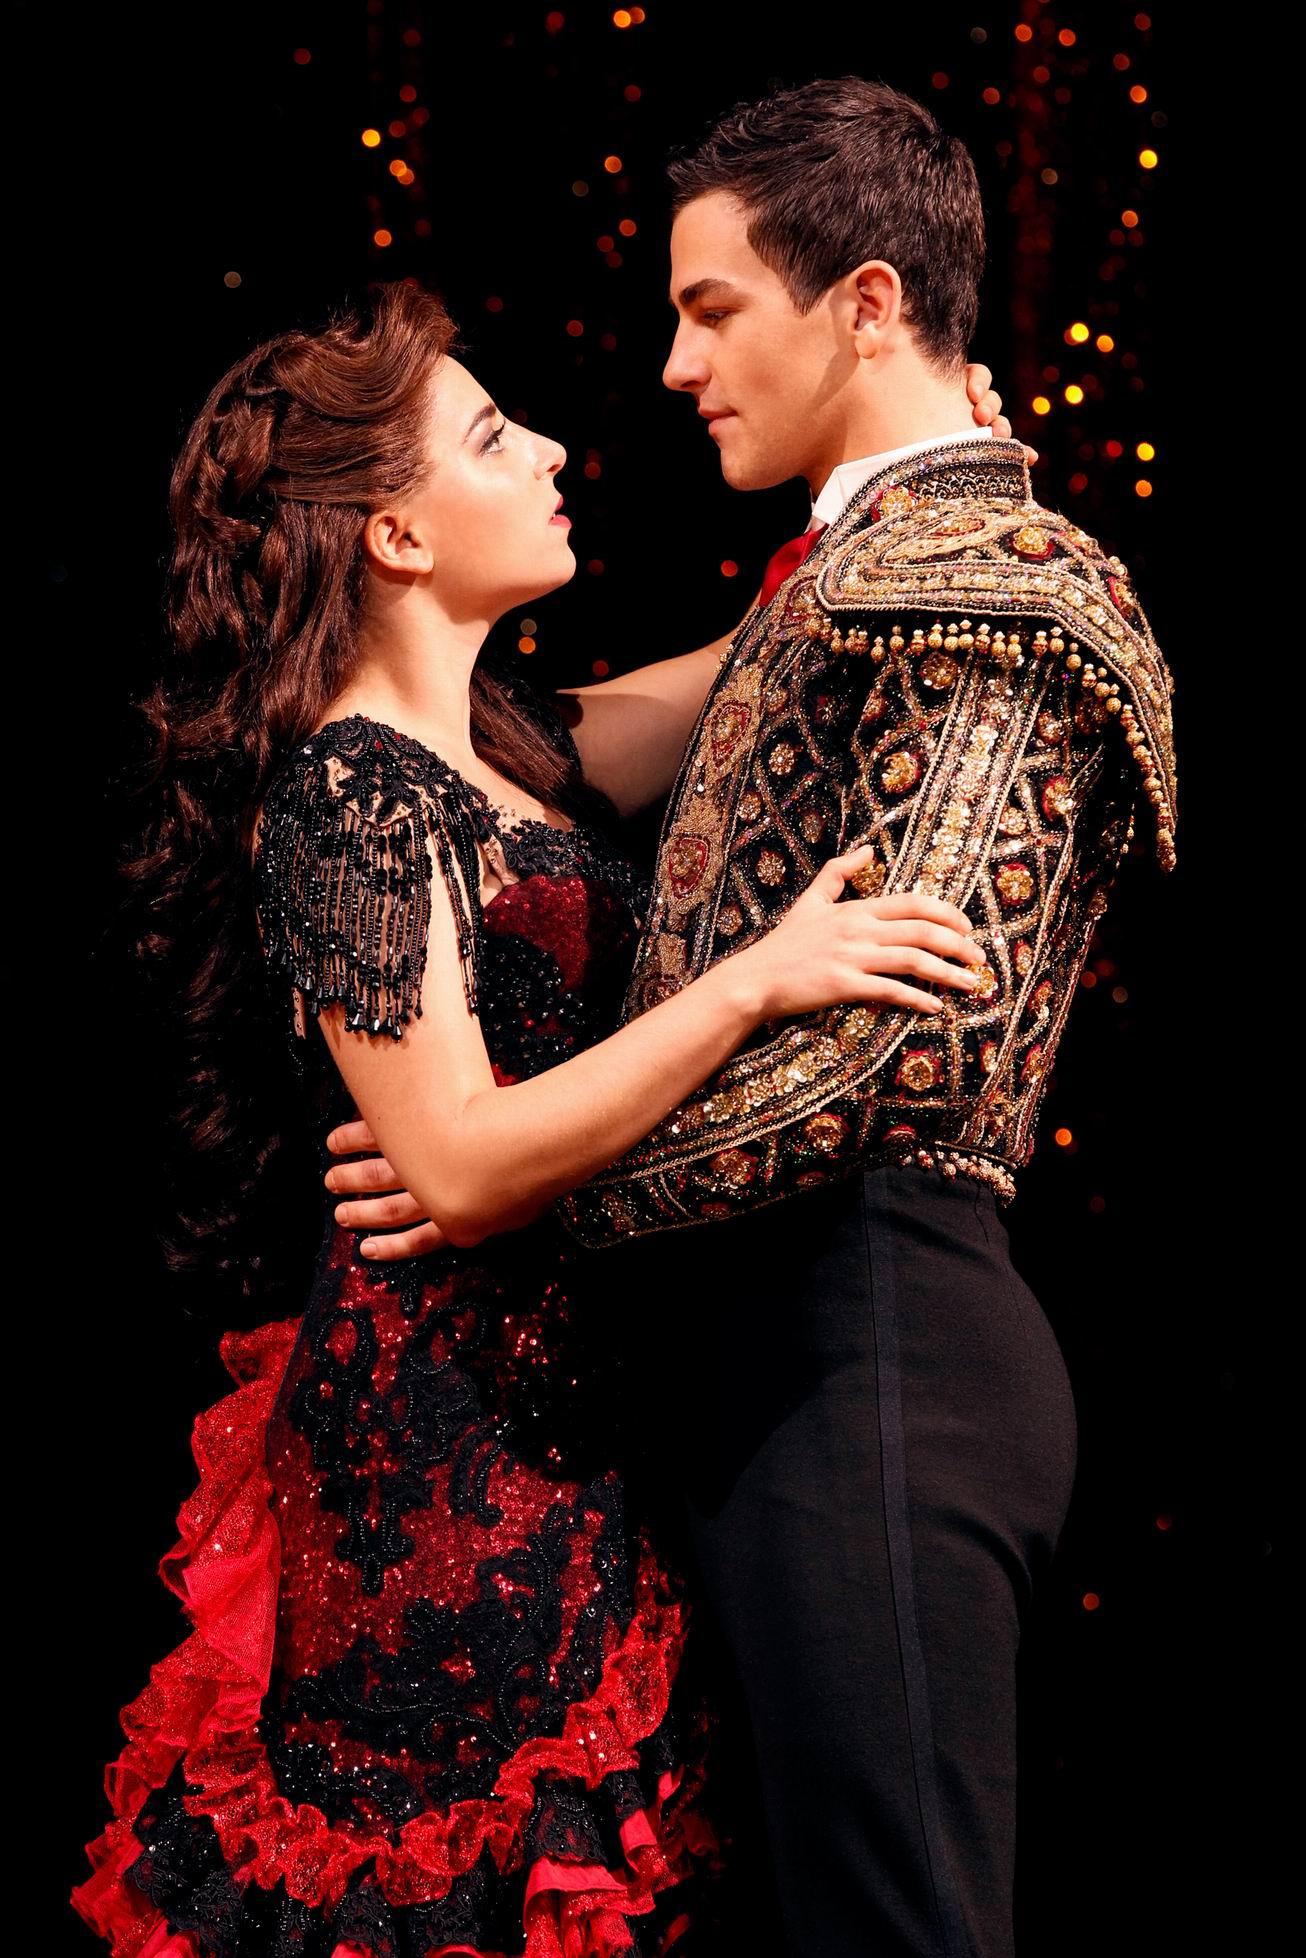 Phoebe Panaretos - Strictly Ballroom The Musical